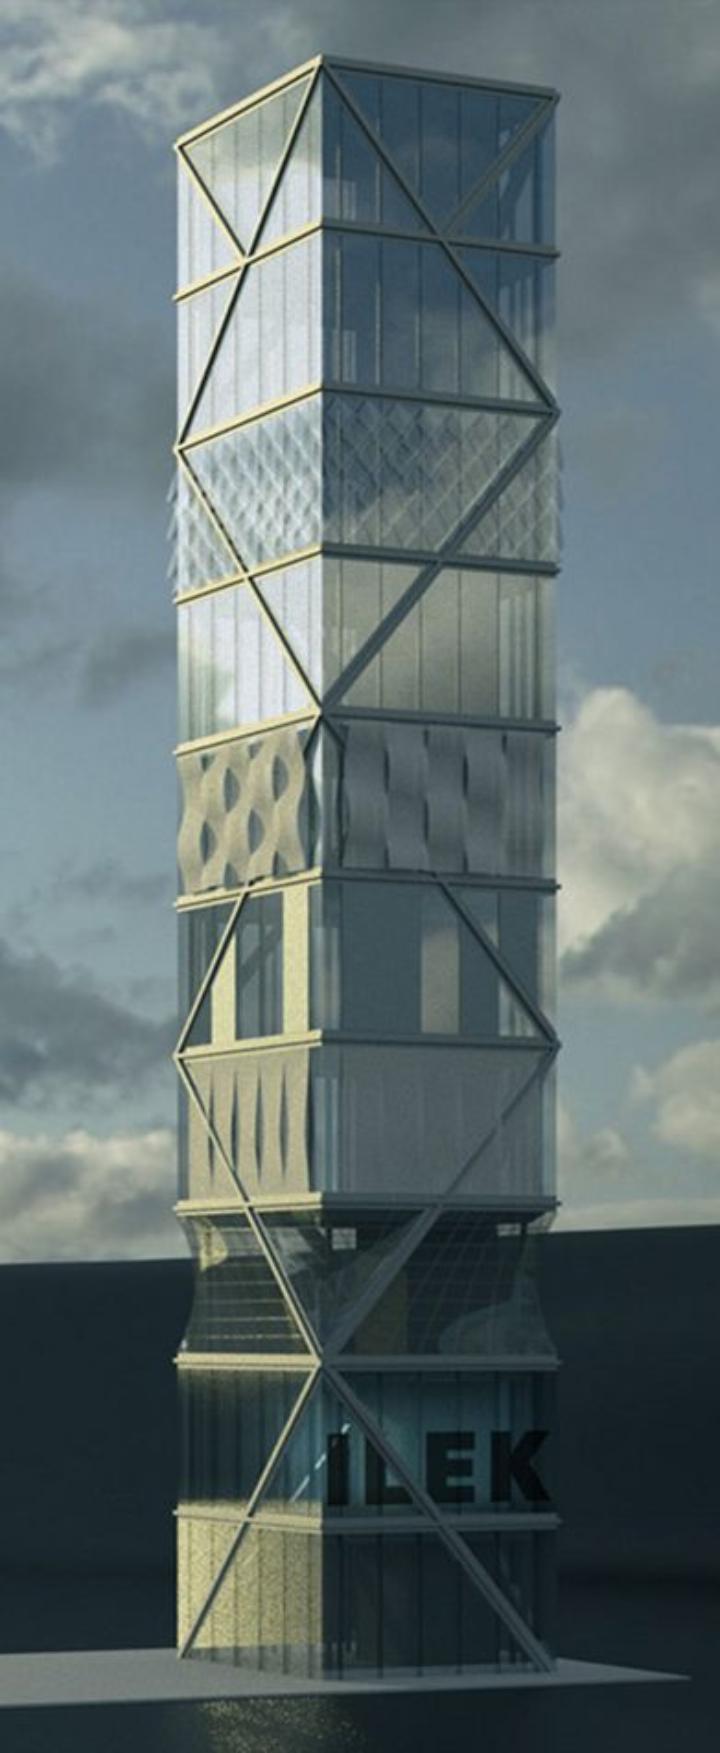 Demonstrator-Turm des SFB 1244 (Visualisierung)